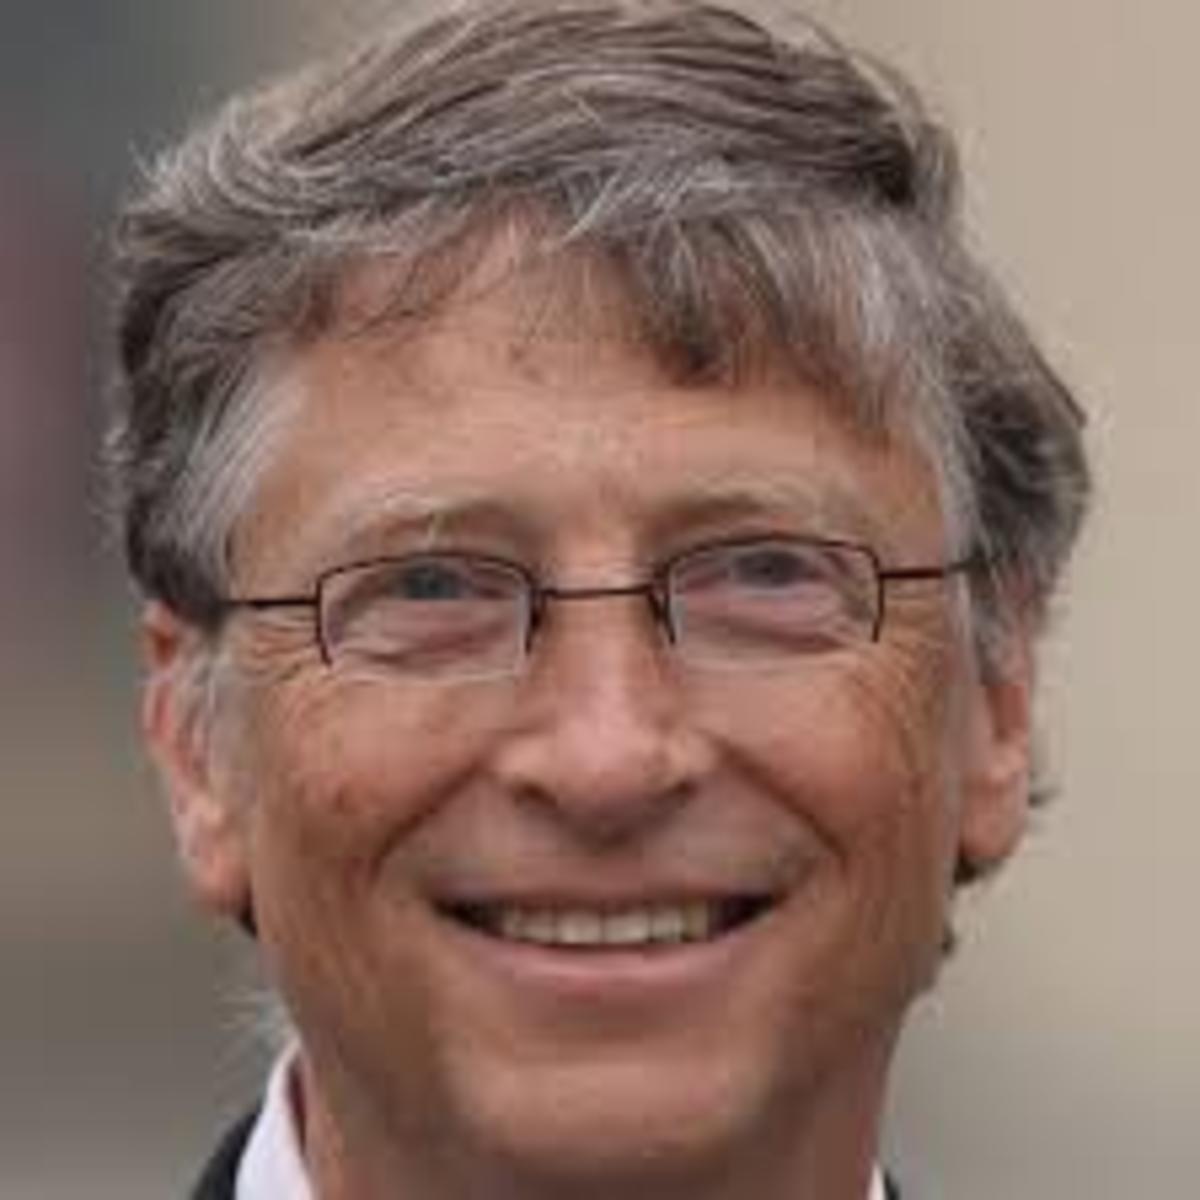 Bill Gates, developer of Microsoft. Successful introversion at work.